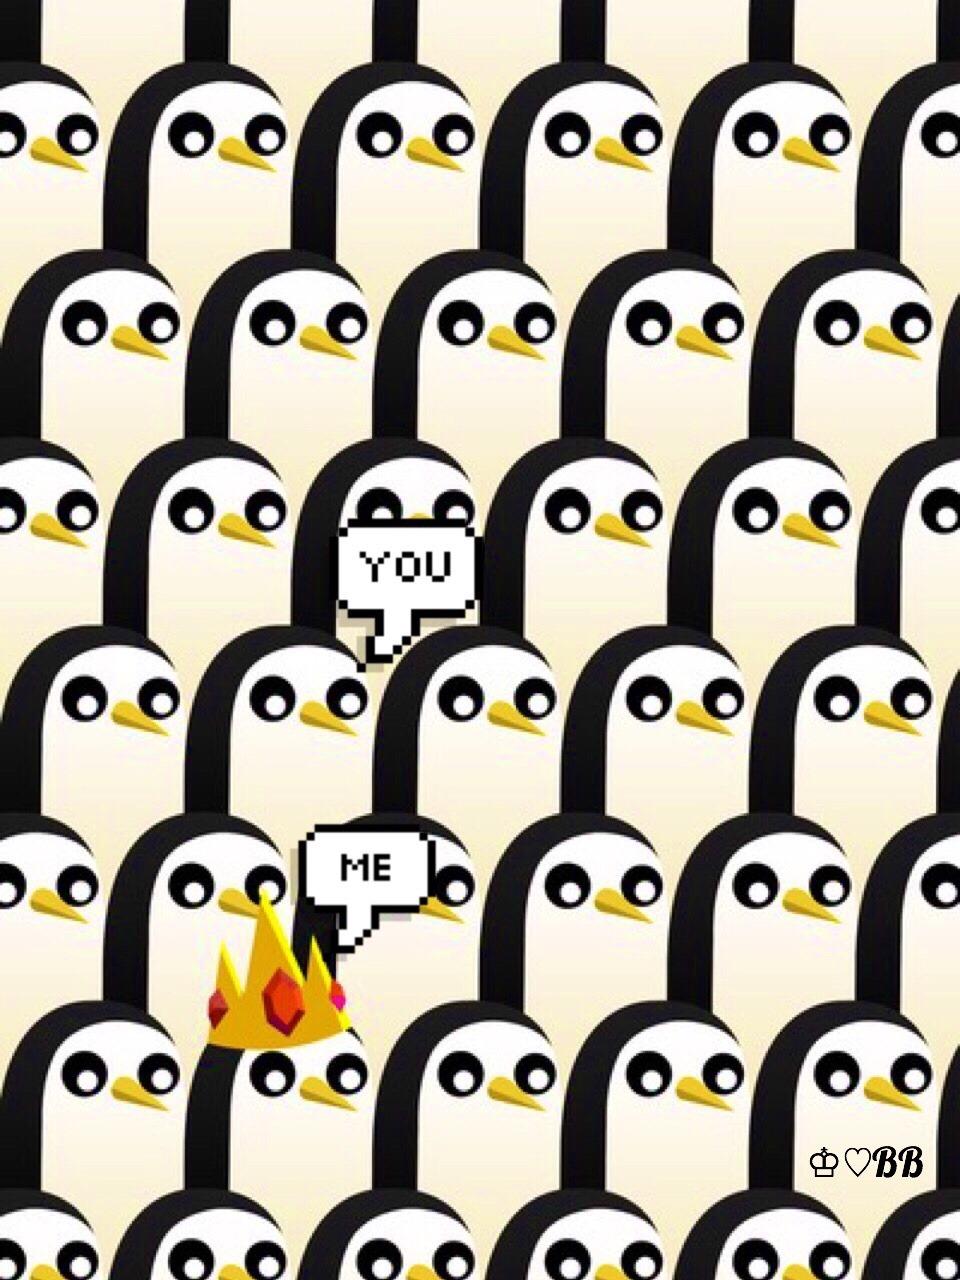 Starbucks Wallpaper Cute Penguin Wallpaper Tumblr Pictures To Pin On Pinterest